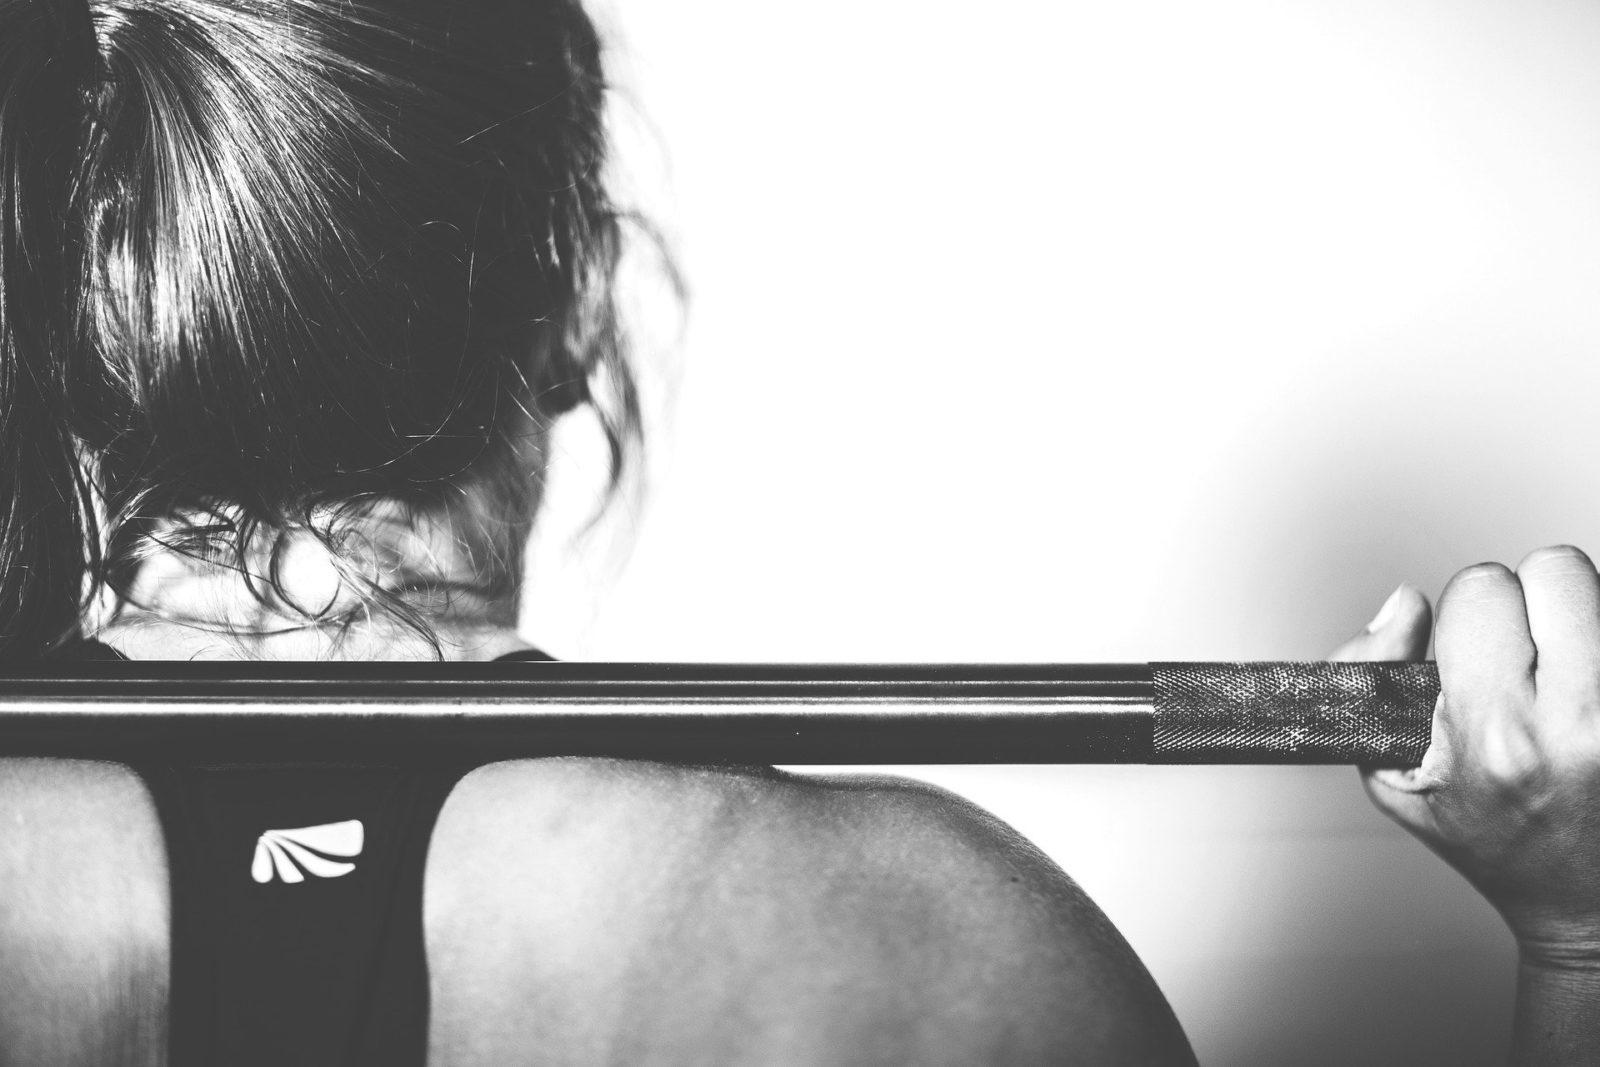 entrenament força resistencia-força-explosiva-força-màxima-força-hipertròfia